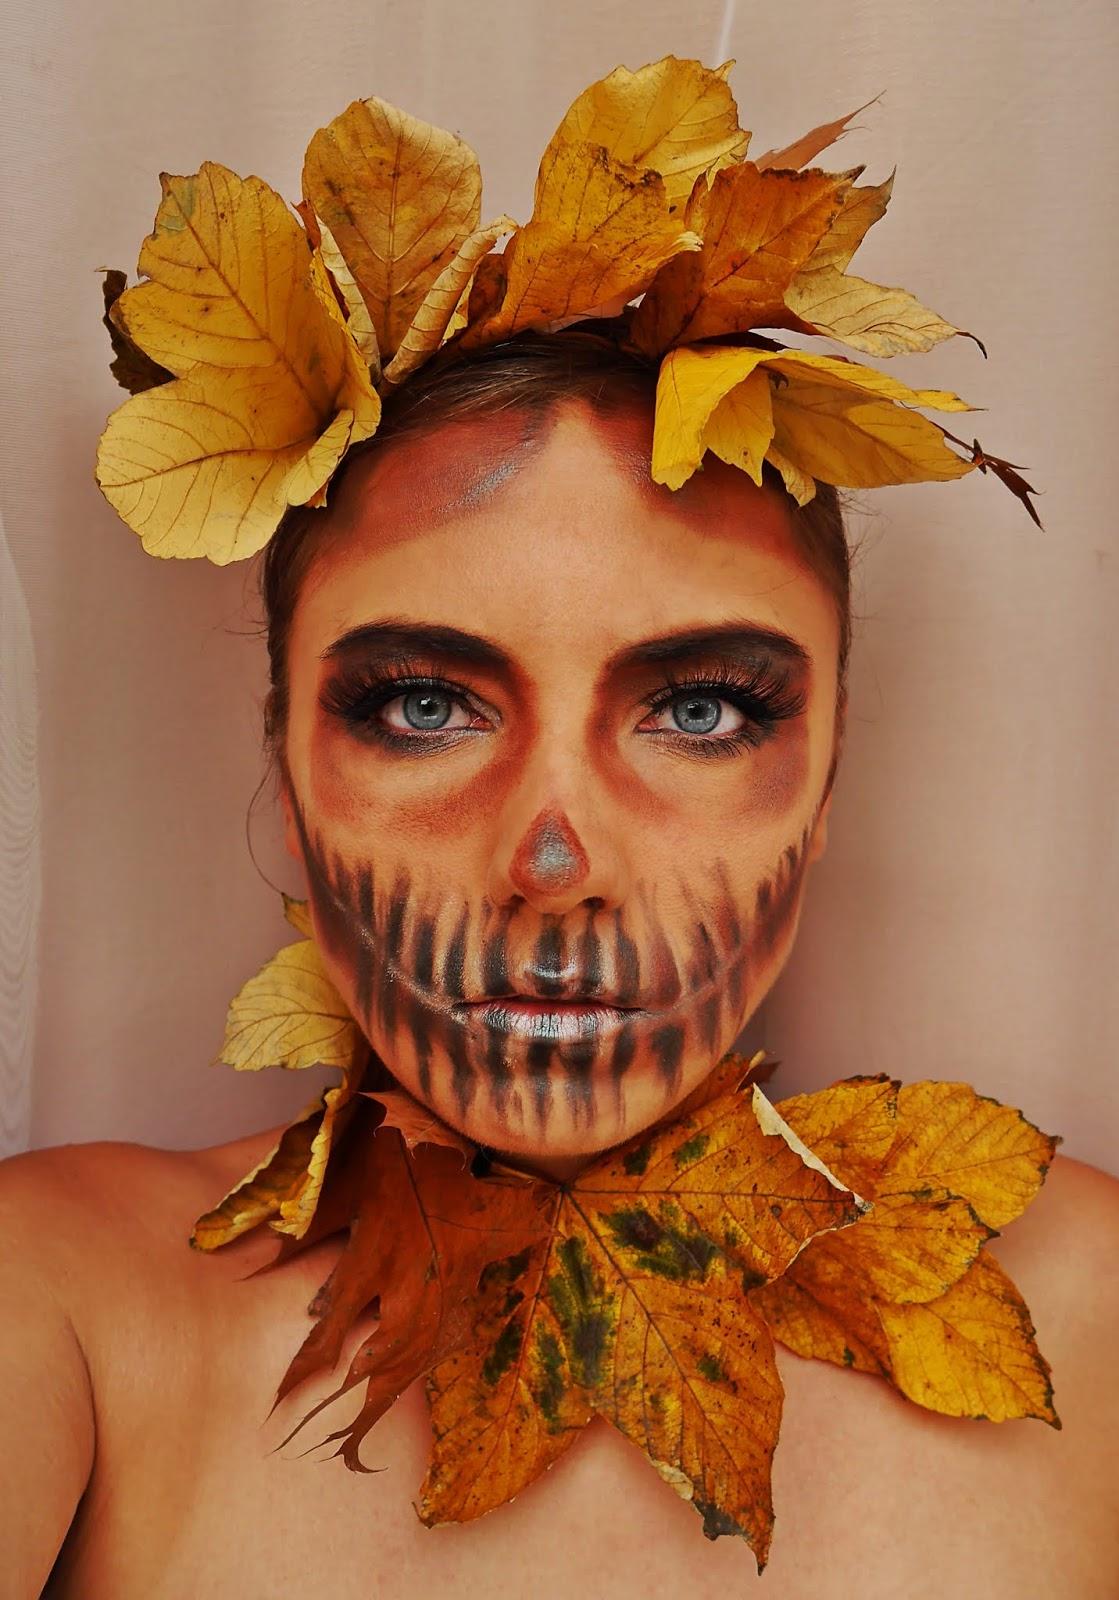 1_makijaz_halloween_dynia_wetnwild_cosmetics_karyn_blog-modowy_301018